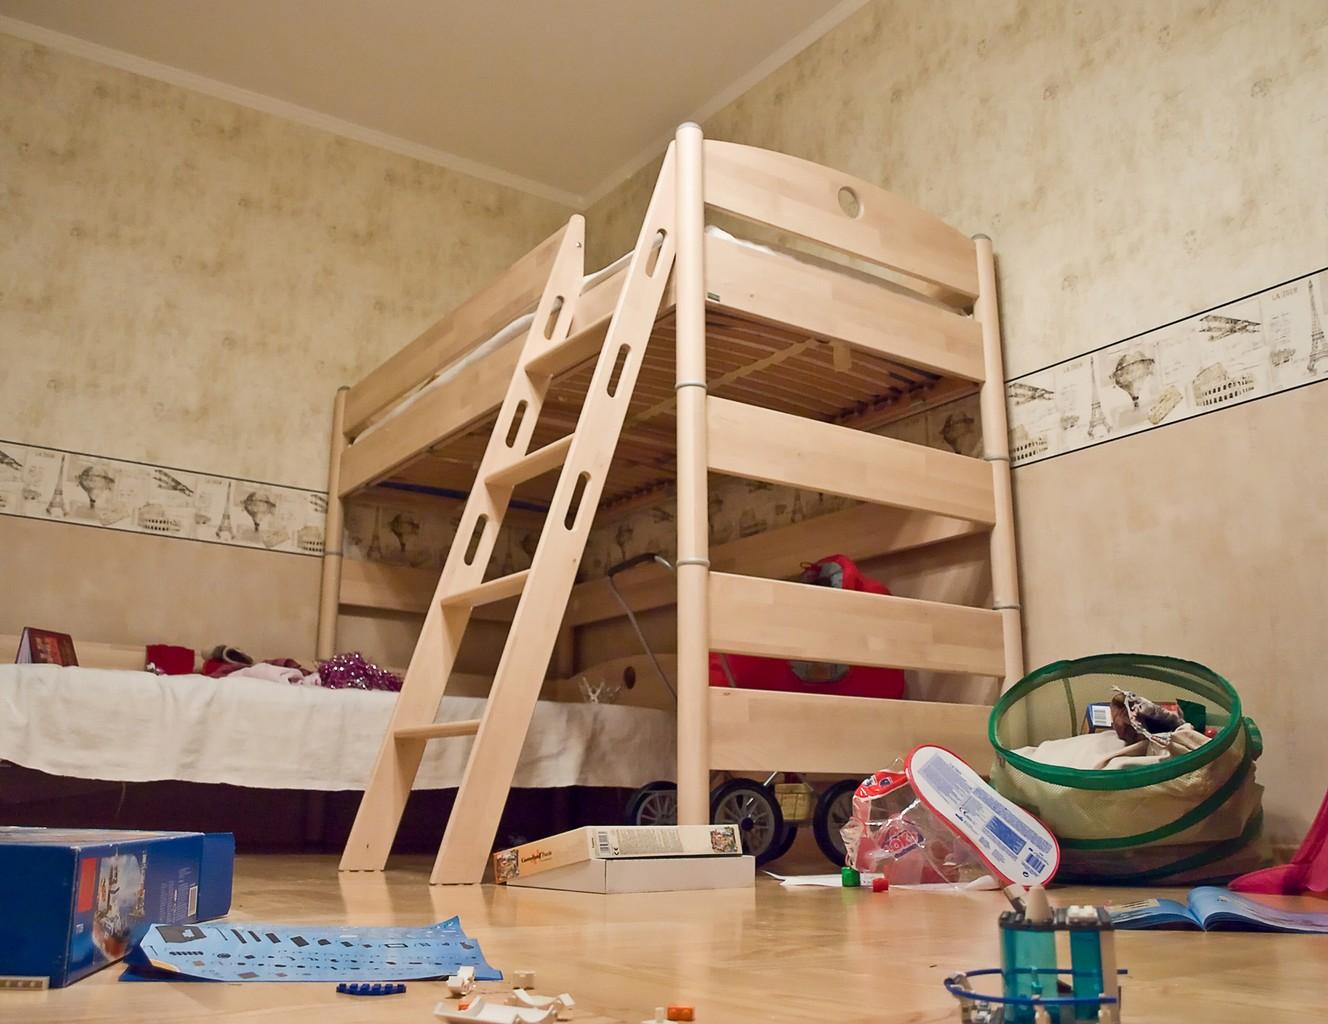 Construire une mezzanine ou un lit mezzanine - Fabrication mezzanine bois ...